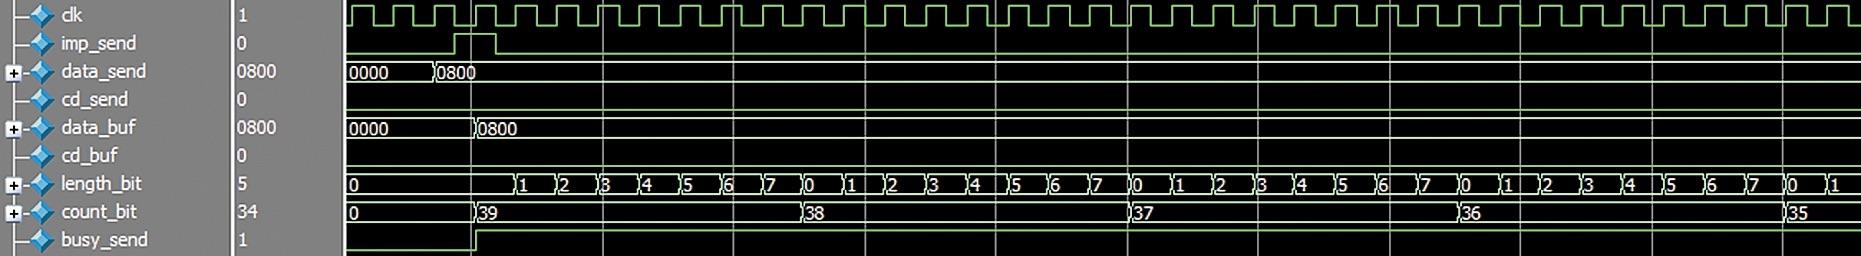 Временные диаграммы модуля Transmitter.v